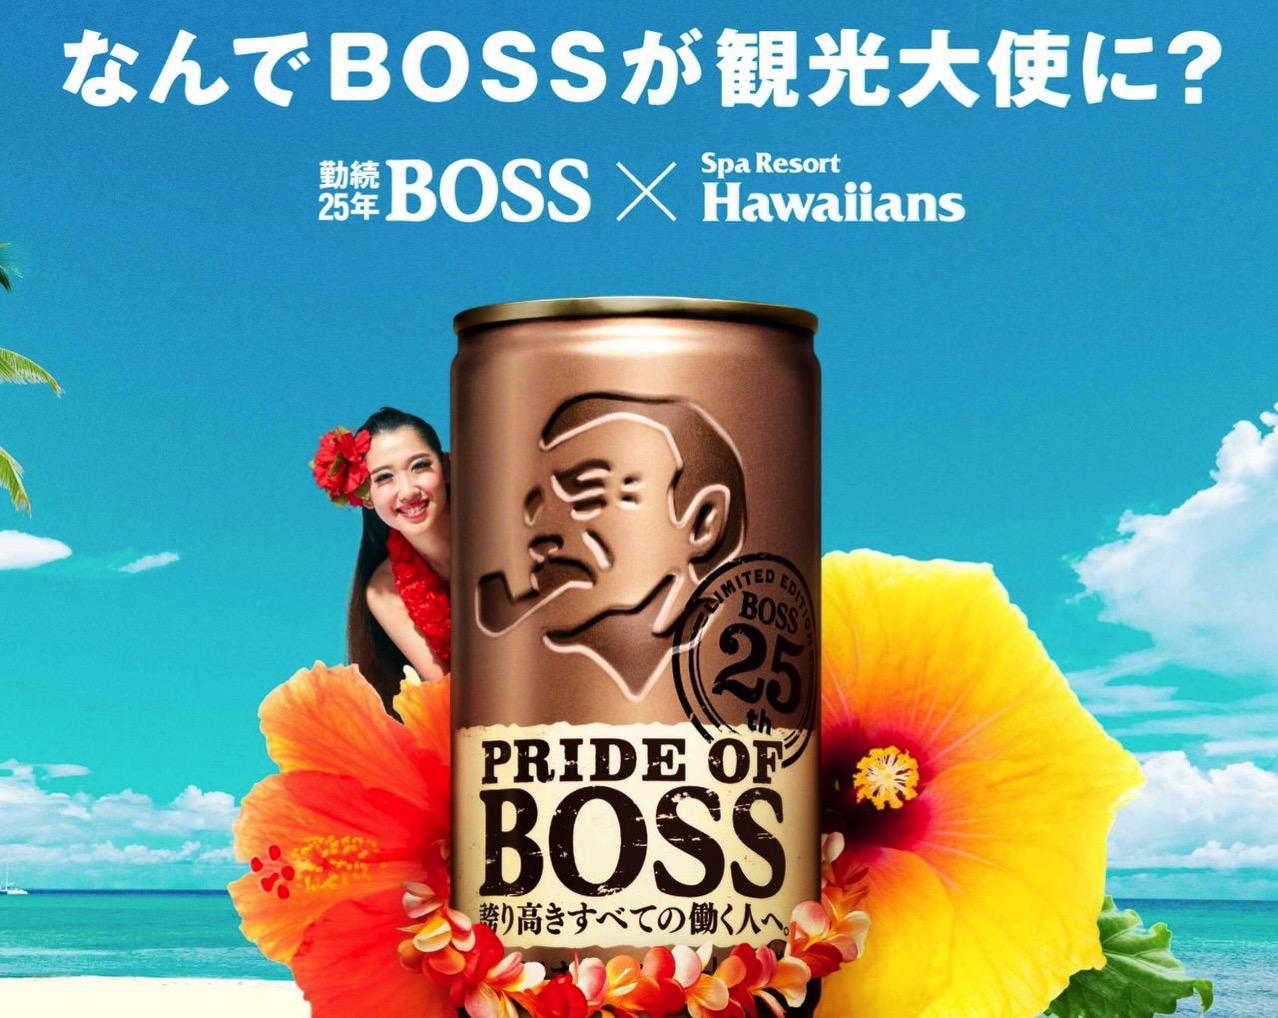 BOSSがハワイアンズの観光大使に就任 #ボスでハワイ #ハワイアンズ便就航